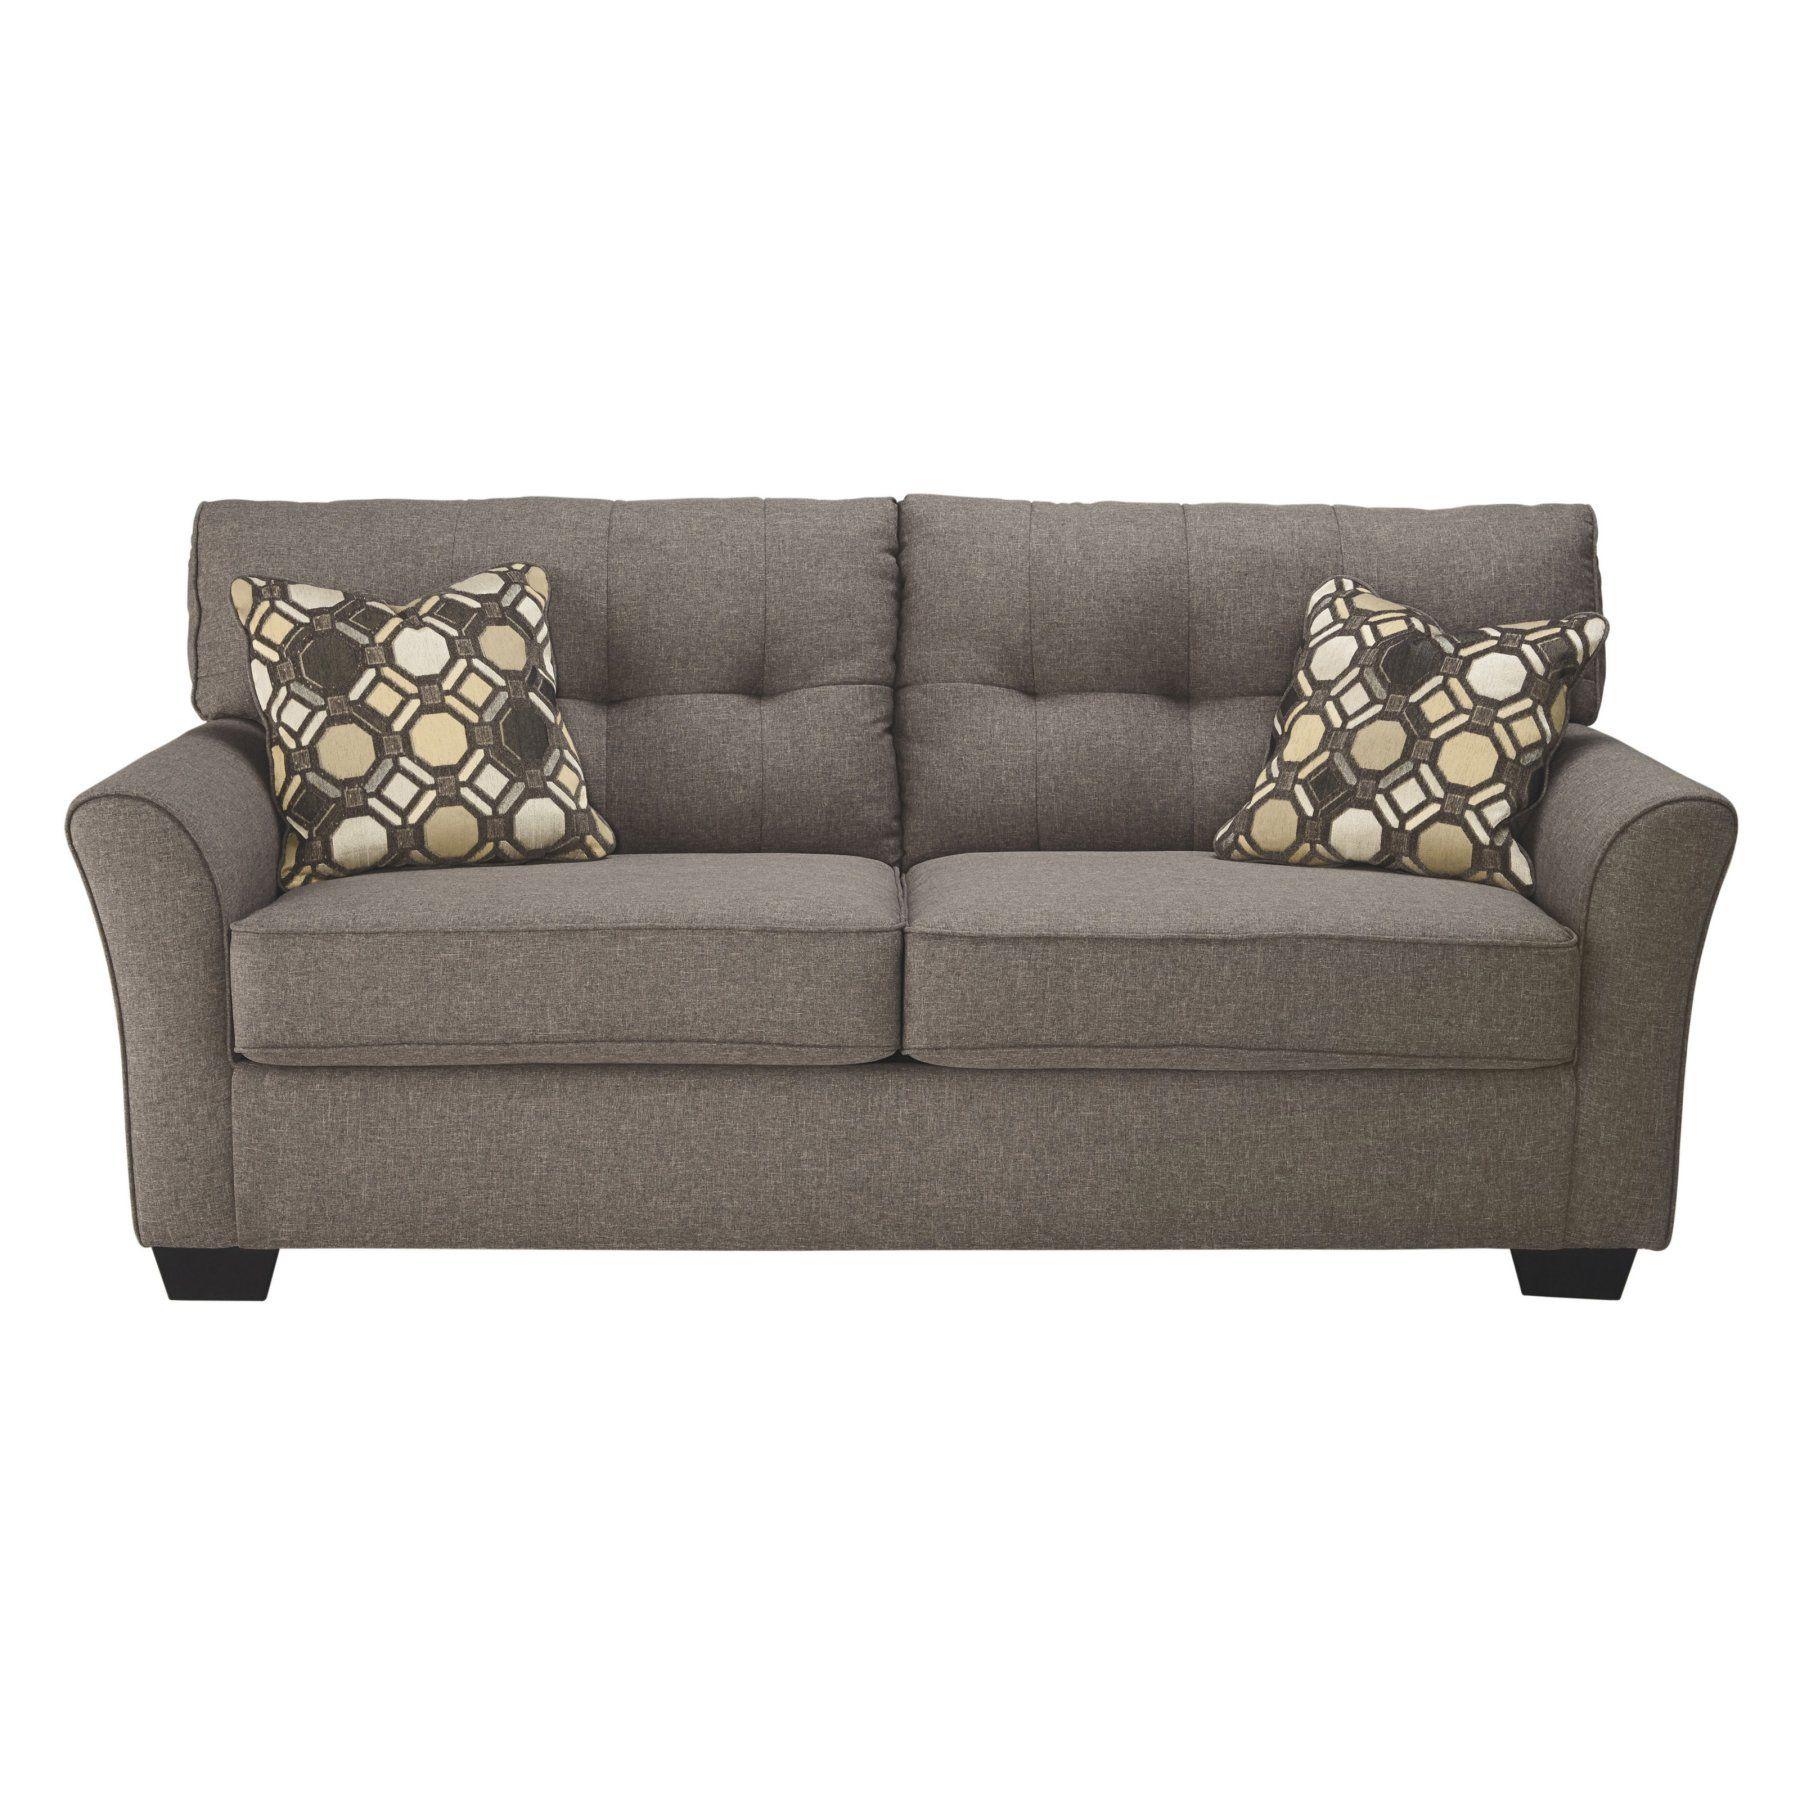 Signature Design By Ashley Tibbee Full Sofa Sleeper  9910136